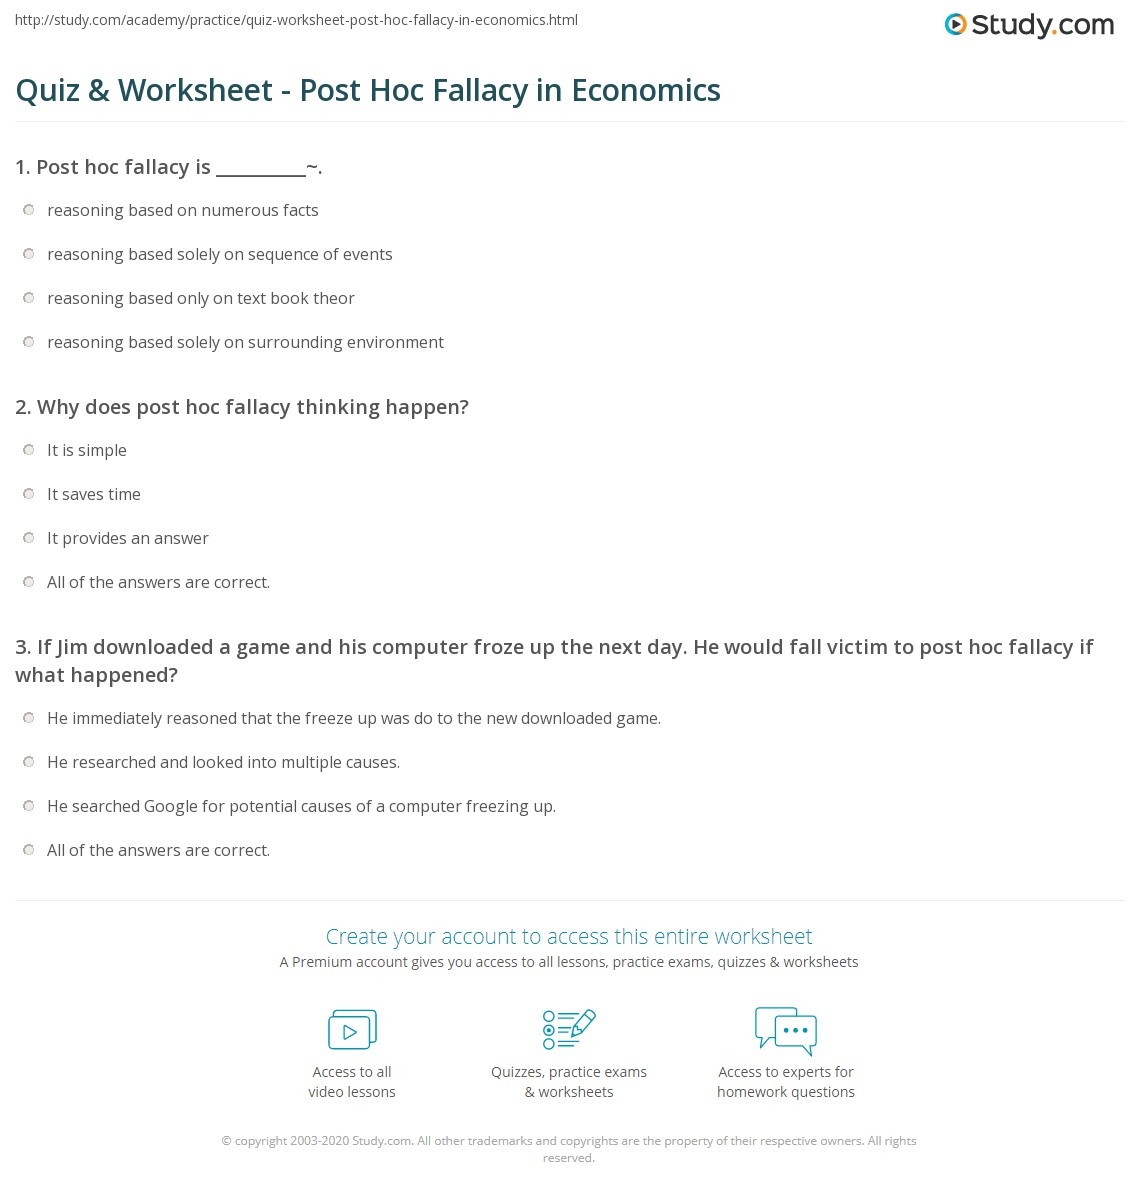 Quiz & Worksheet - Post Hoc Fallacy In Economics